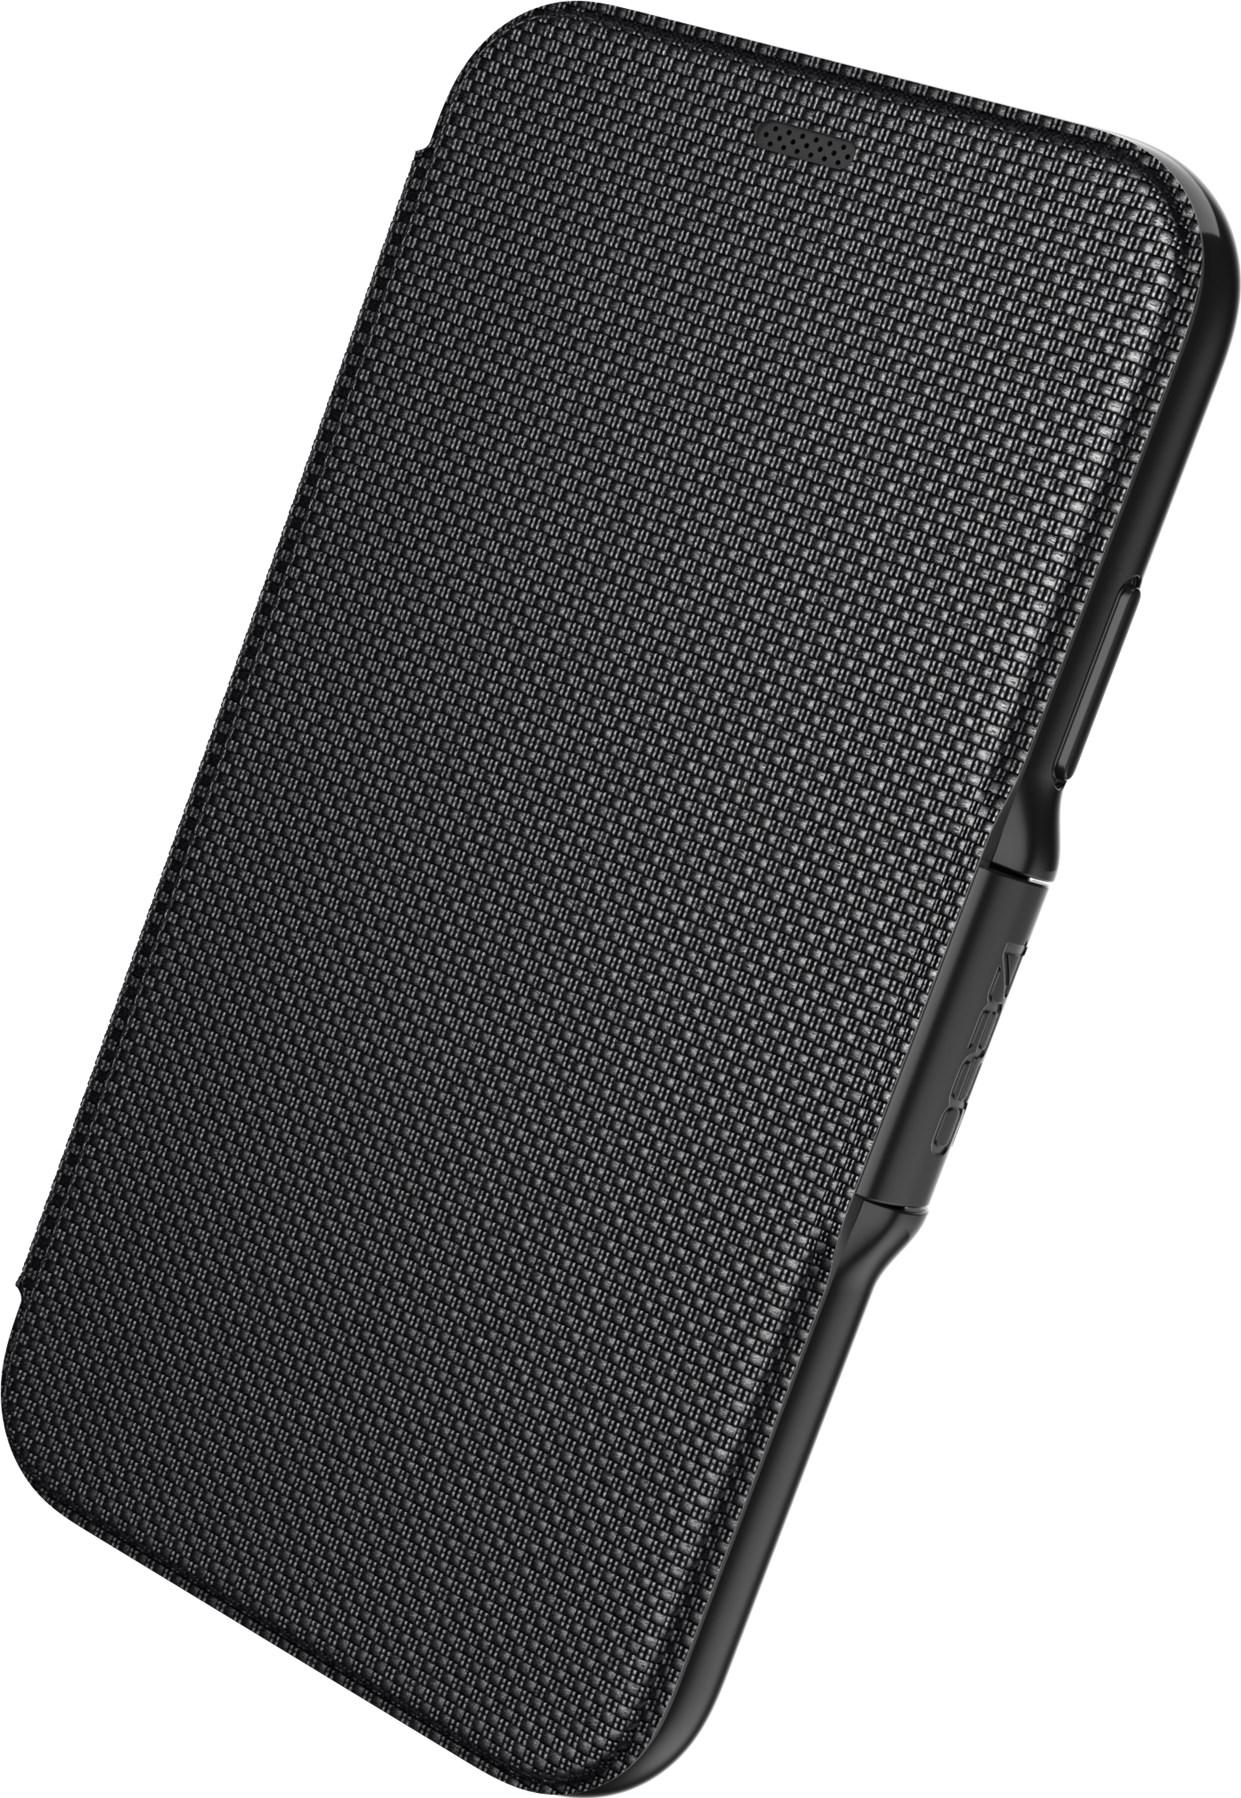 gear4 D3o Oxford Iphone 11 Black